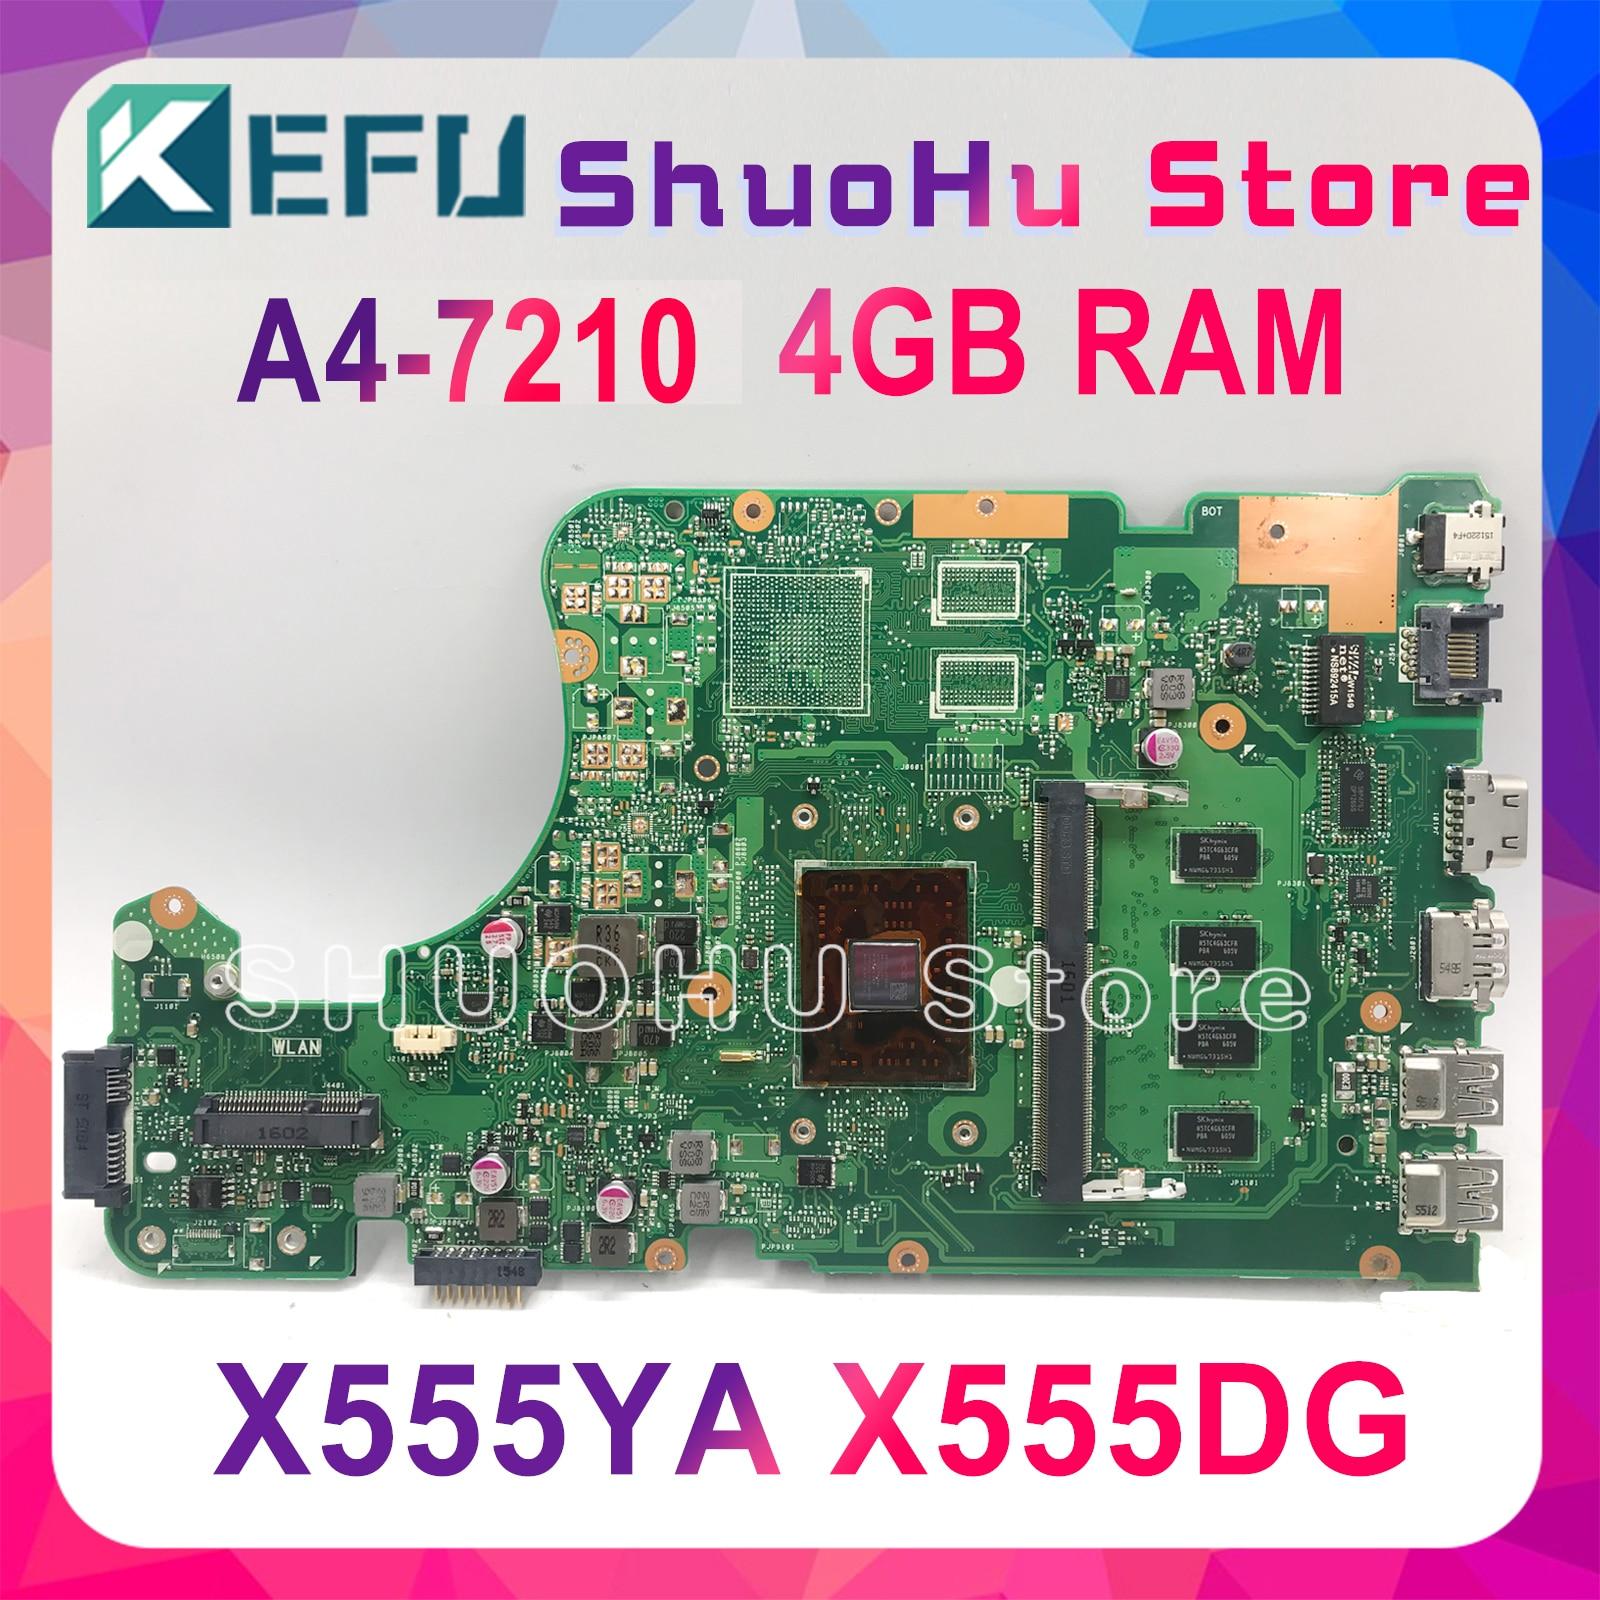 KEFU X555DG placa base para ASUS X555YI X555YA X555D A555DG X555QG X555Y placa base de computadora portátil A4-7210 4GB REV2.0 pruebas 100%